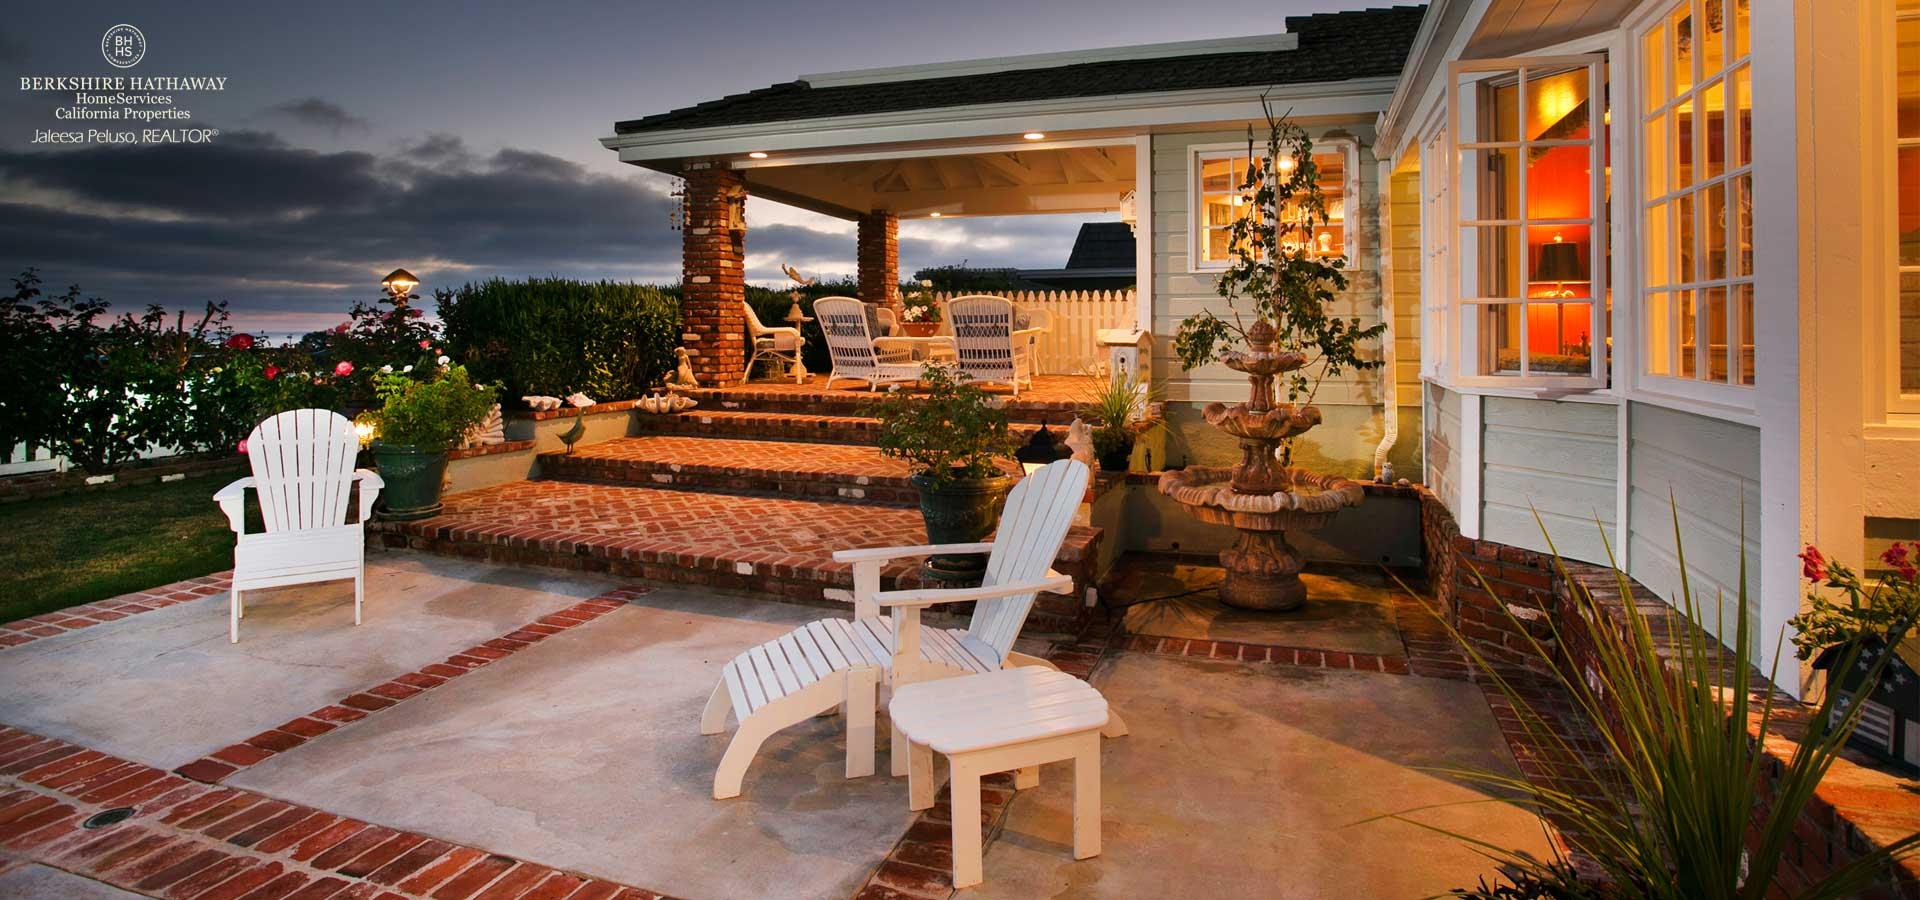 jaleesa peluso monarch bay real estate